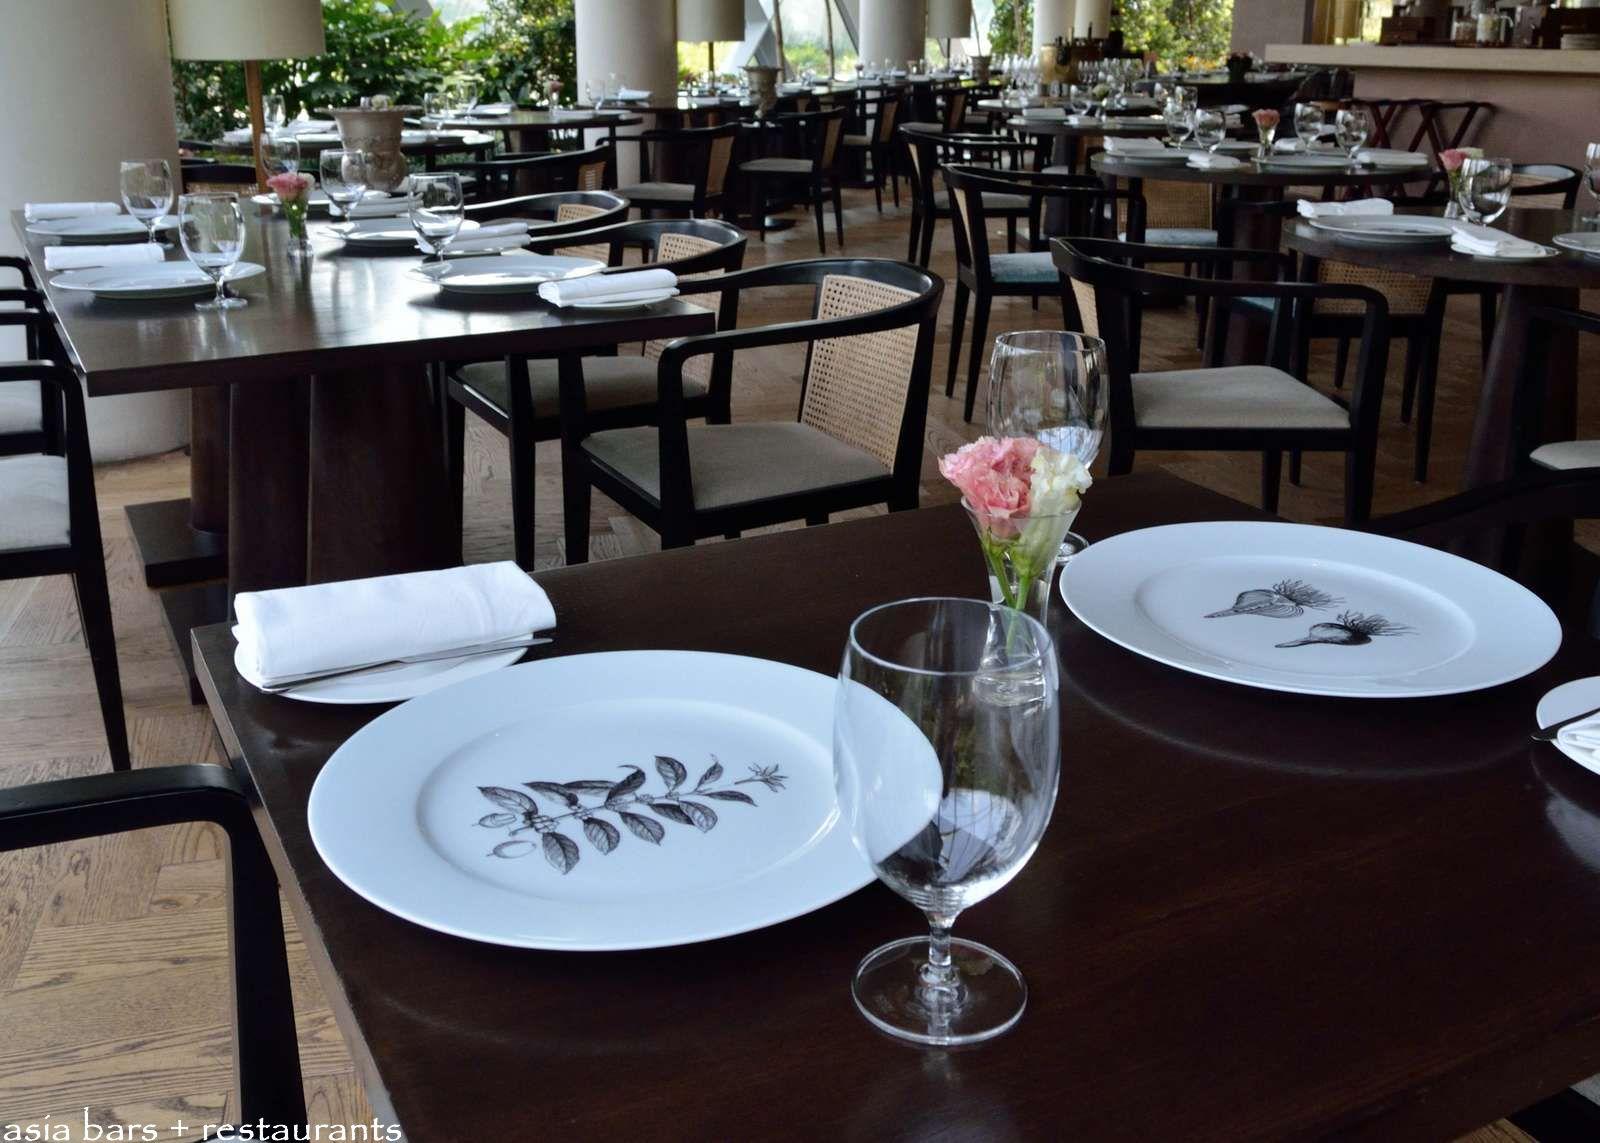 Restaurant table setup - Pollen Fine Dining Restaurant